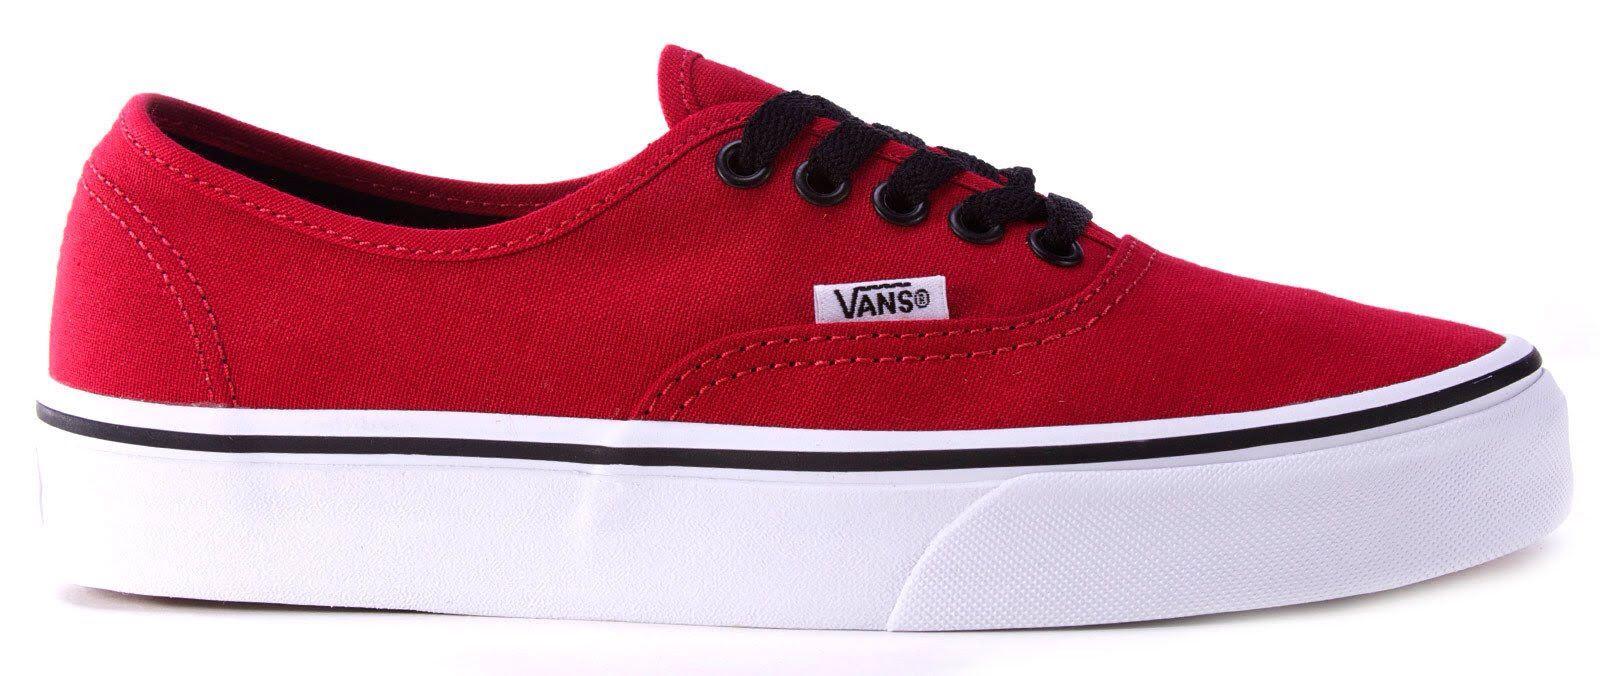 Red Vans with black laces | Cool vans